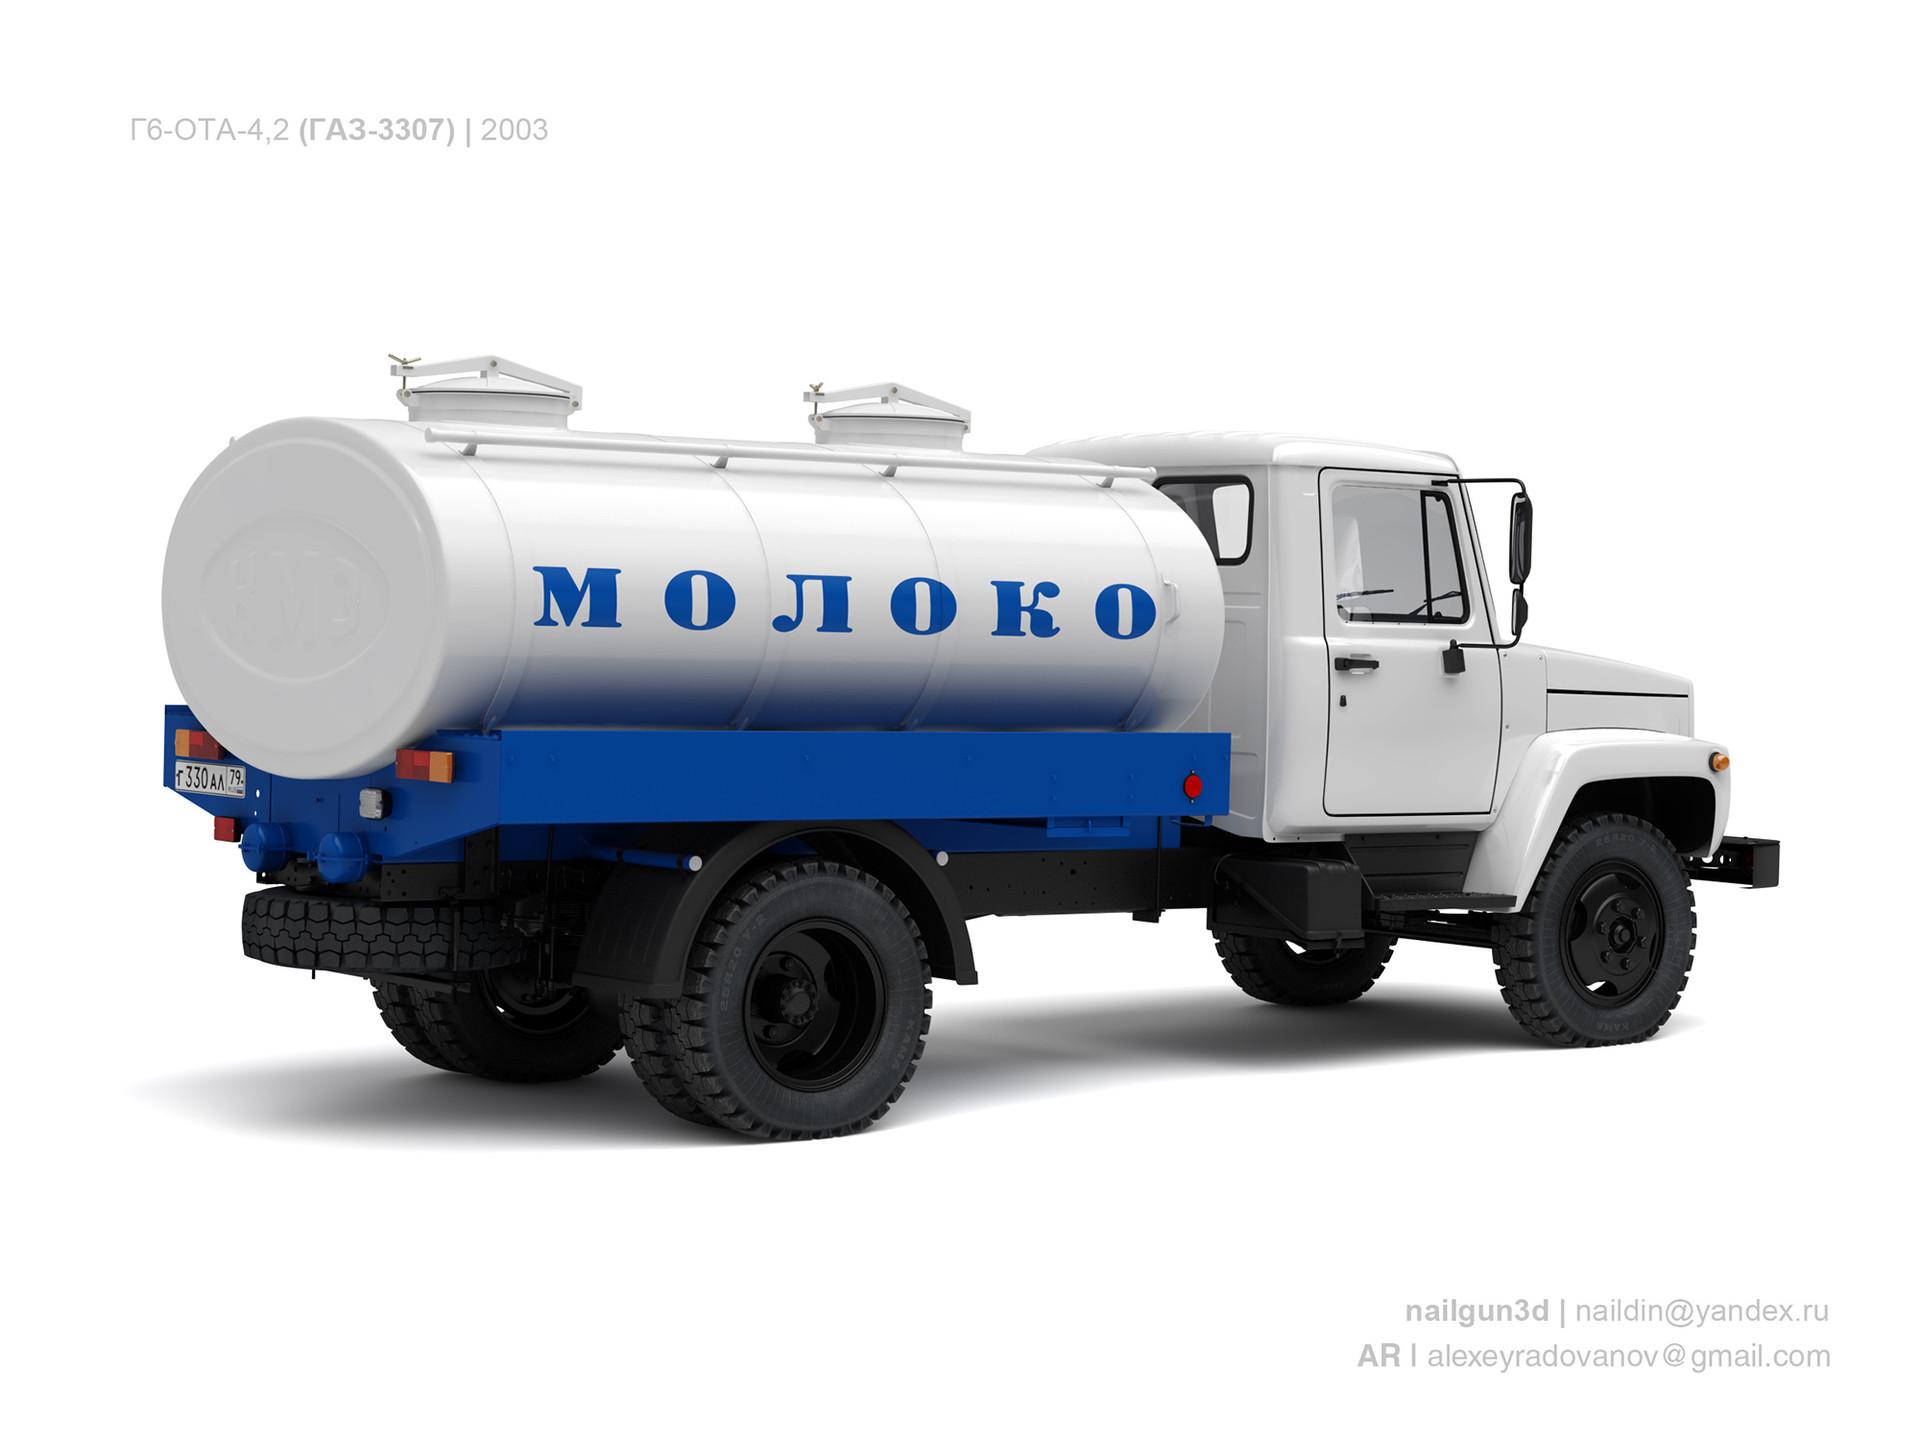 Nail khusnutdinov ussr gaz russia g6 ota 4 2 gaz 3307 2003 1